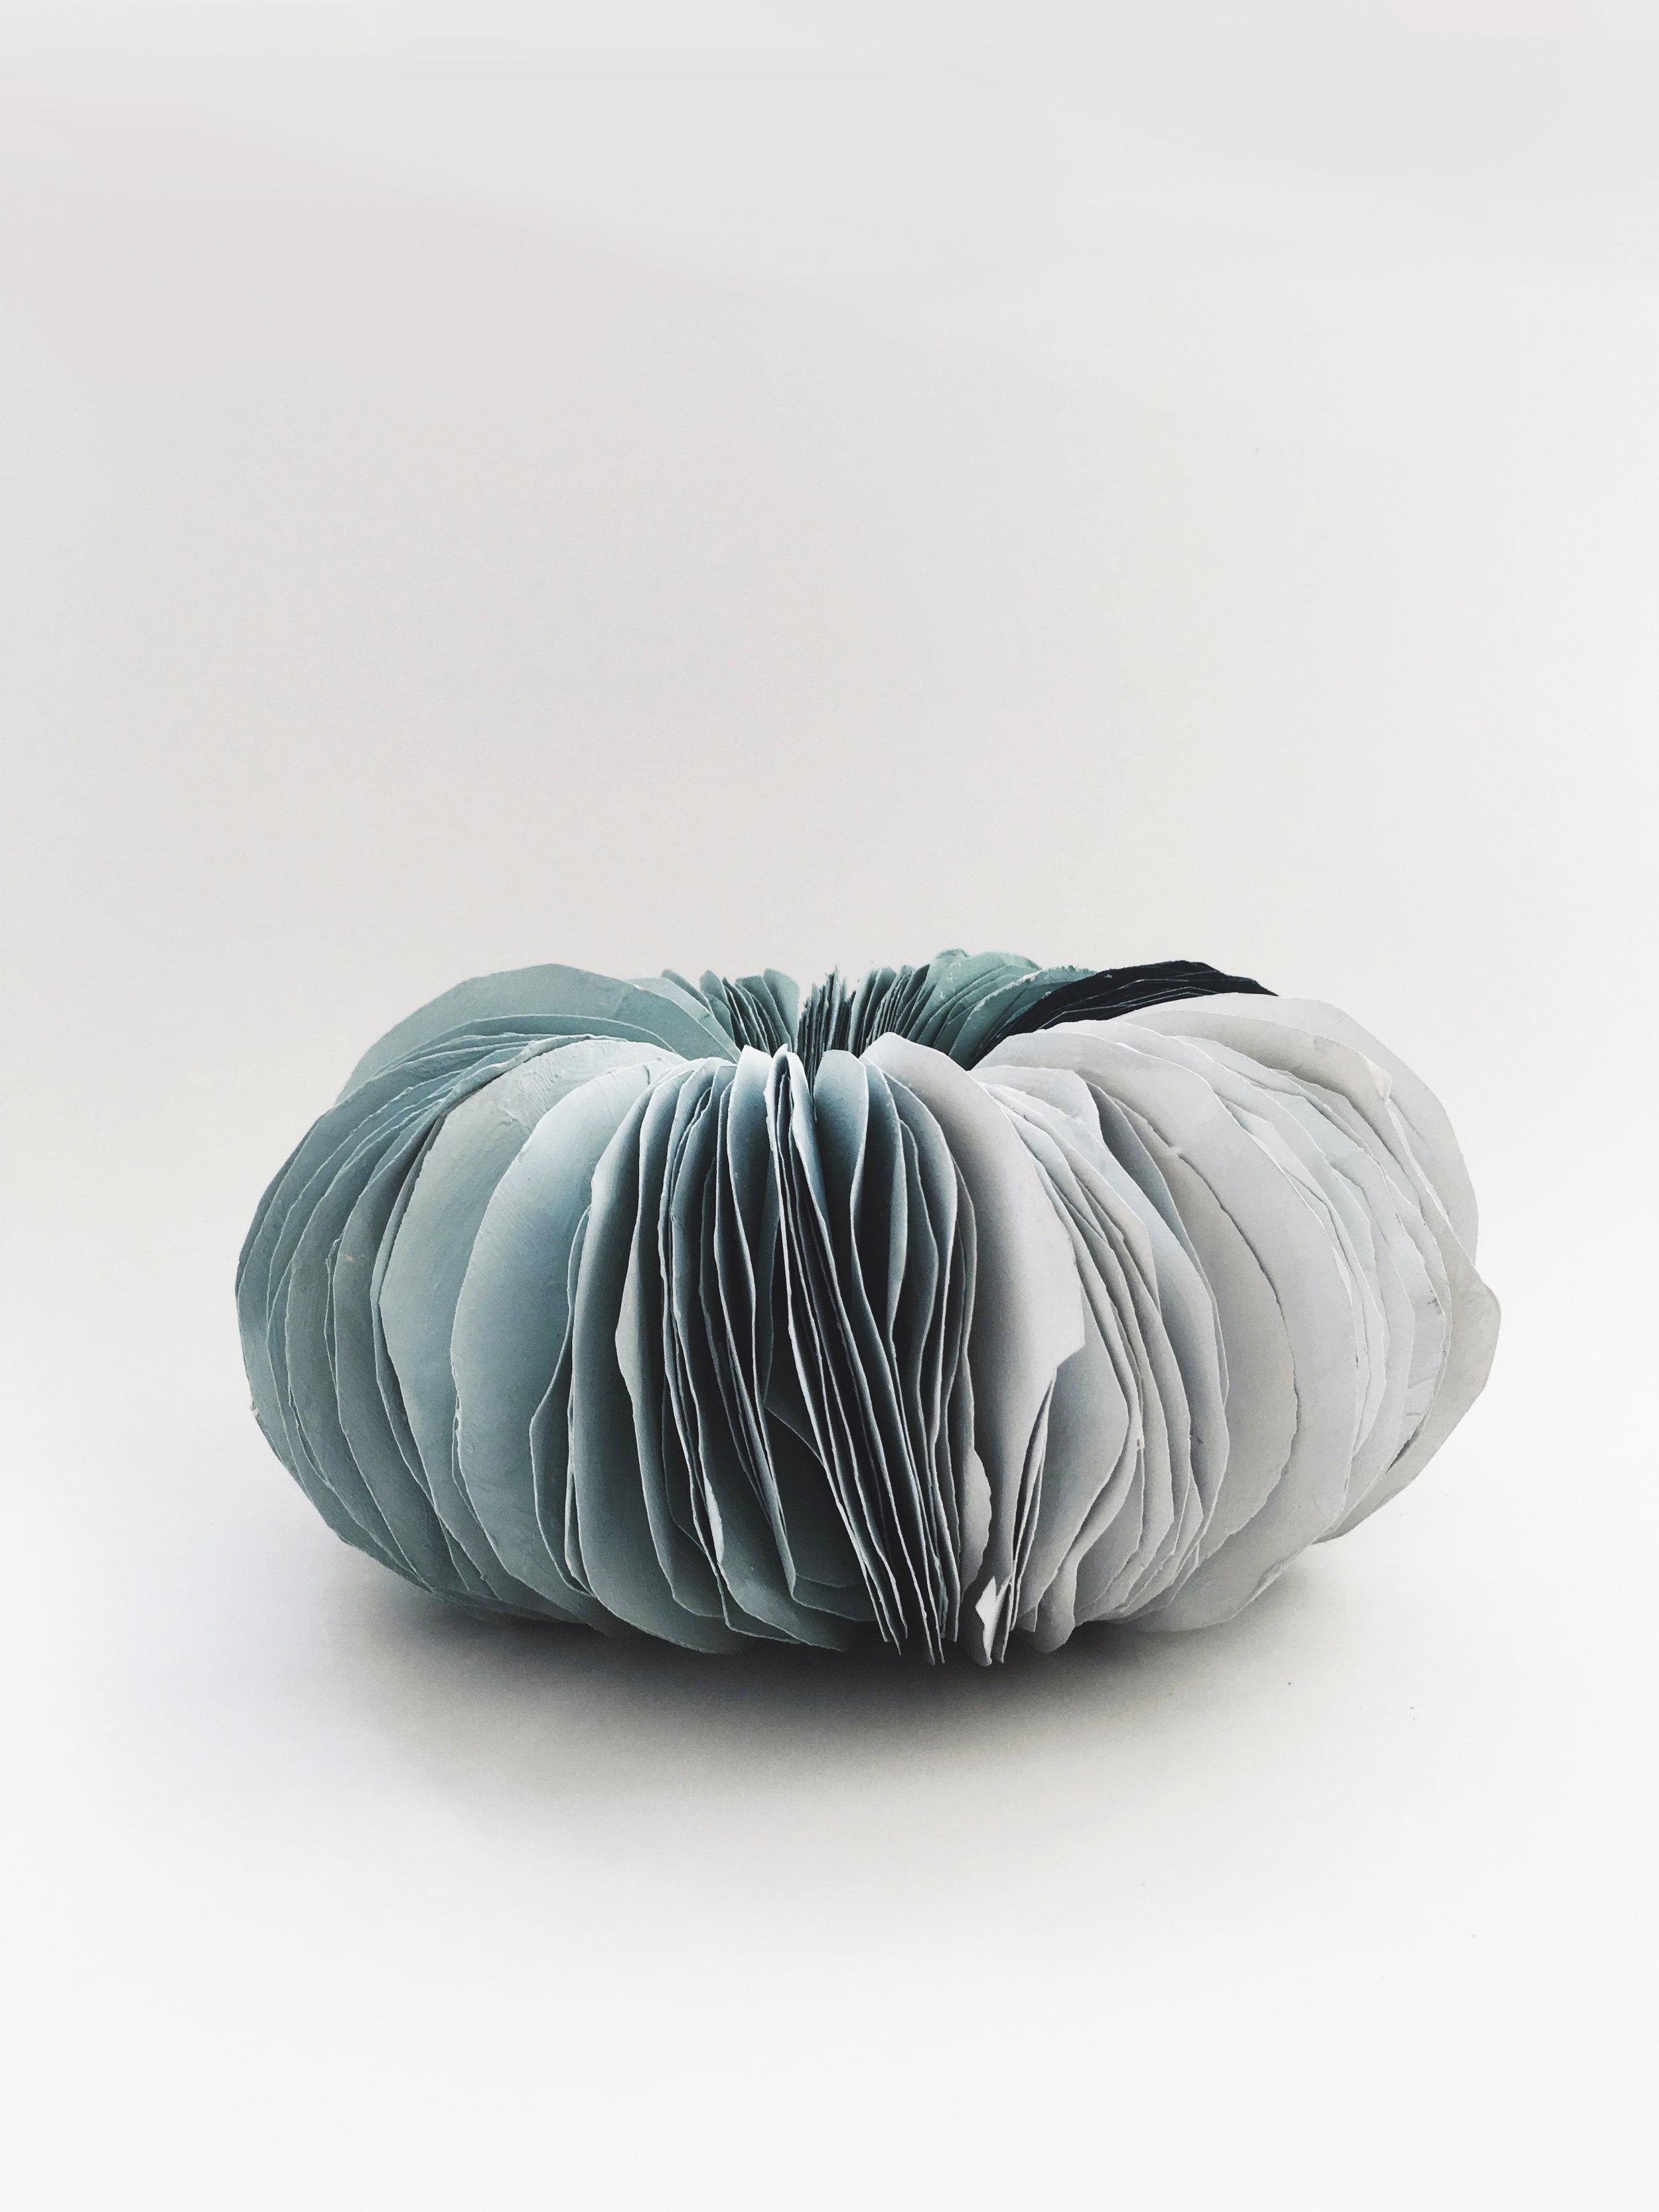 Paper sculpture teal 2016